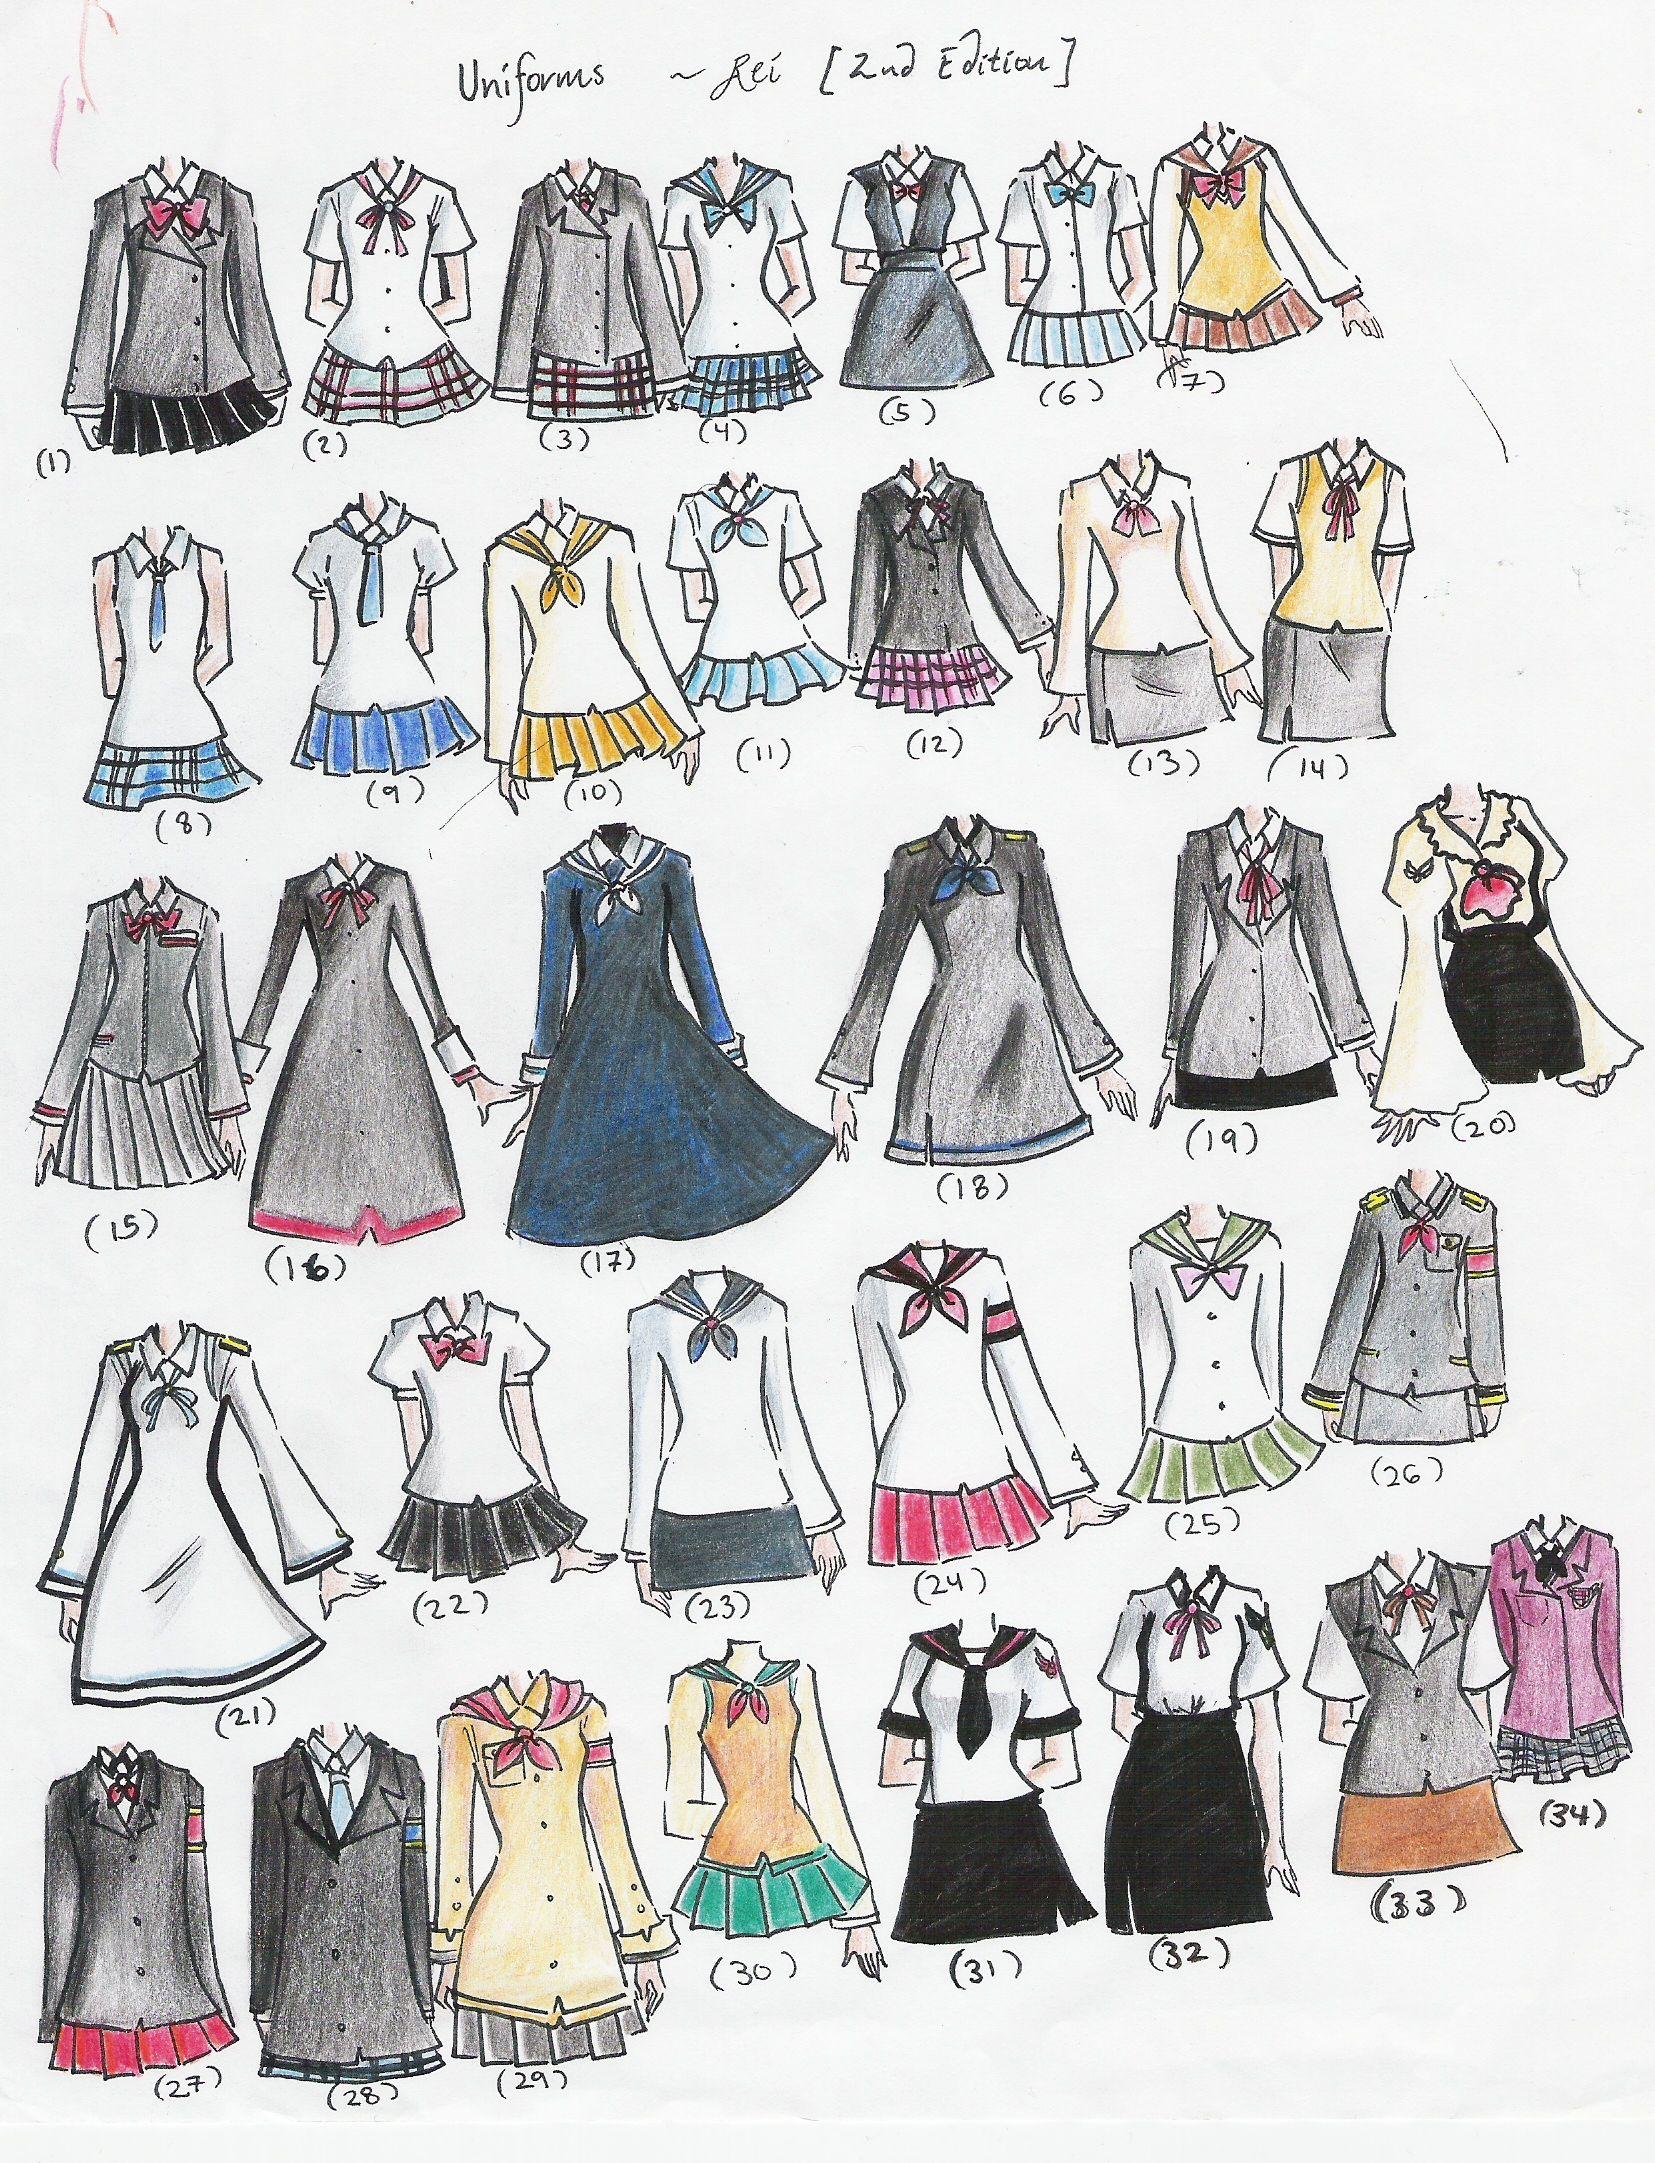 1655x2163 School Uniforms School Uniforms 2nd Edition By Neongenesisevarei